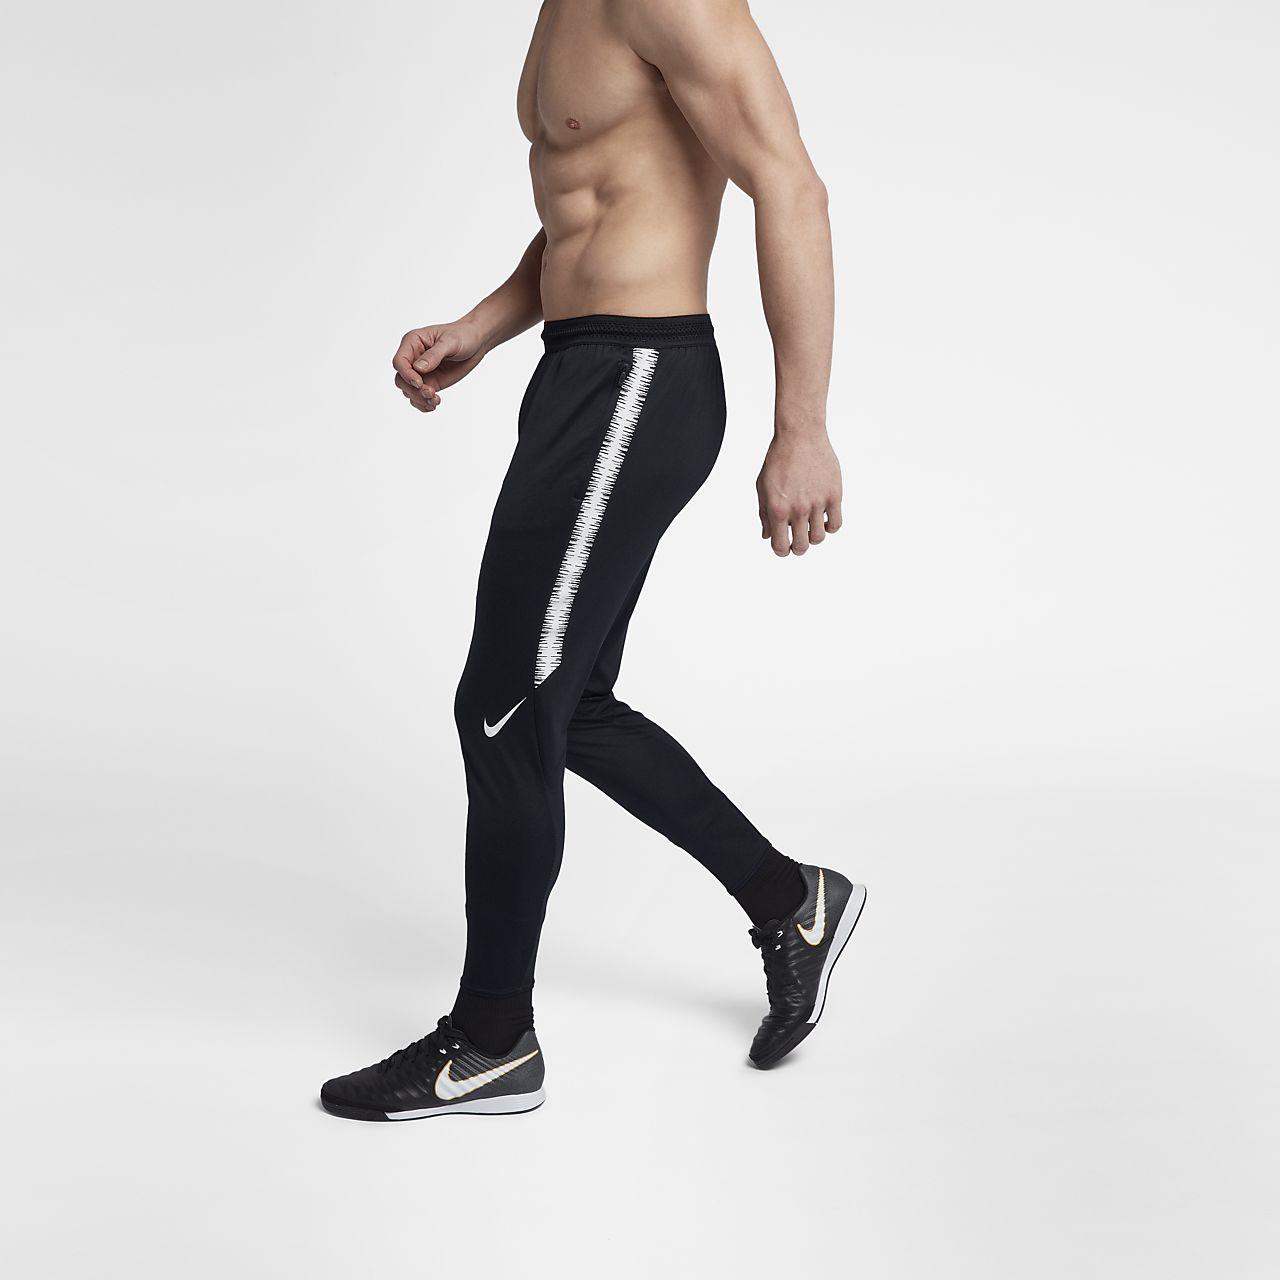 pretty nice 8ddf4 ea138 Men s Football Pants. Nike Flex Strike